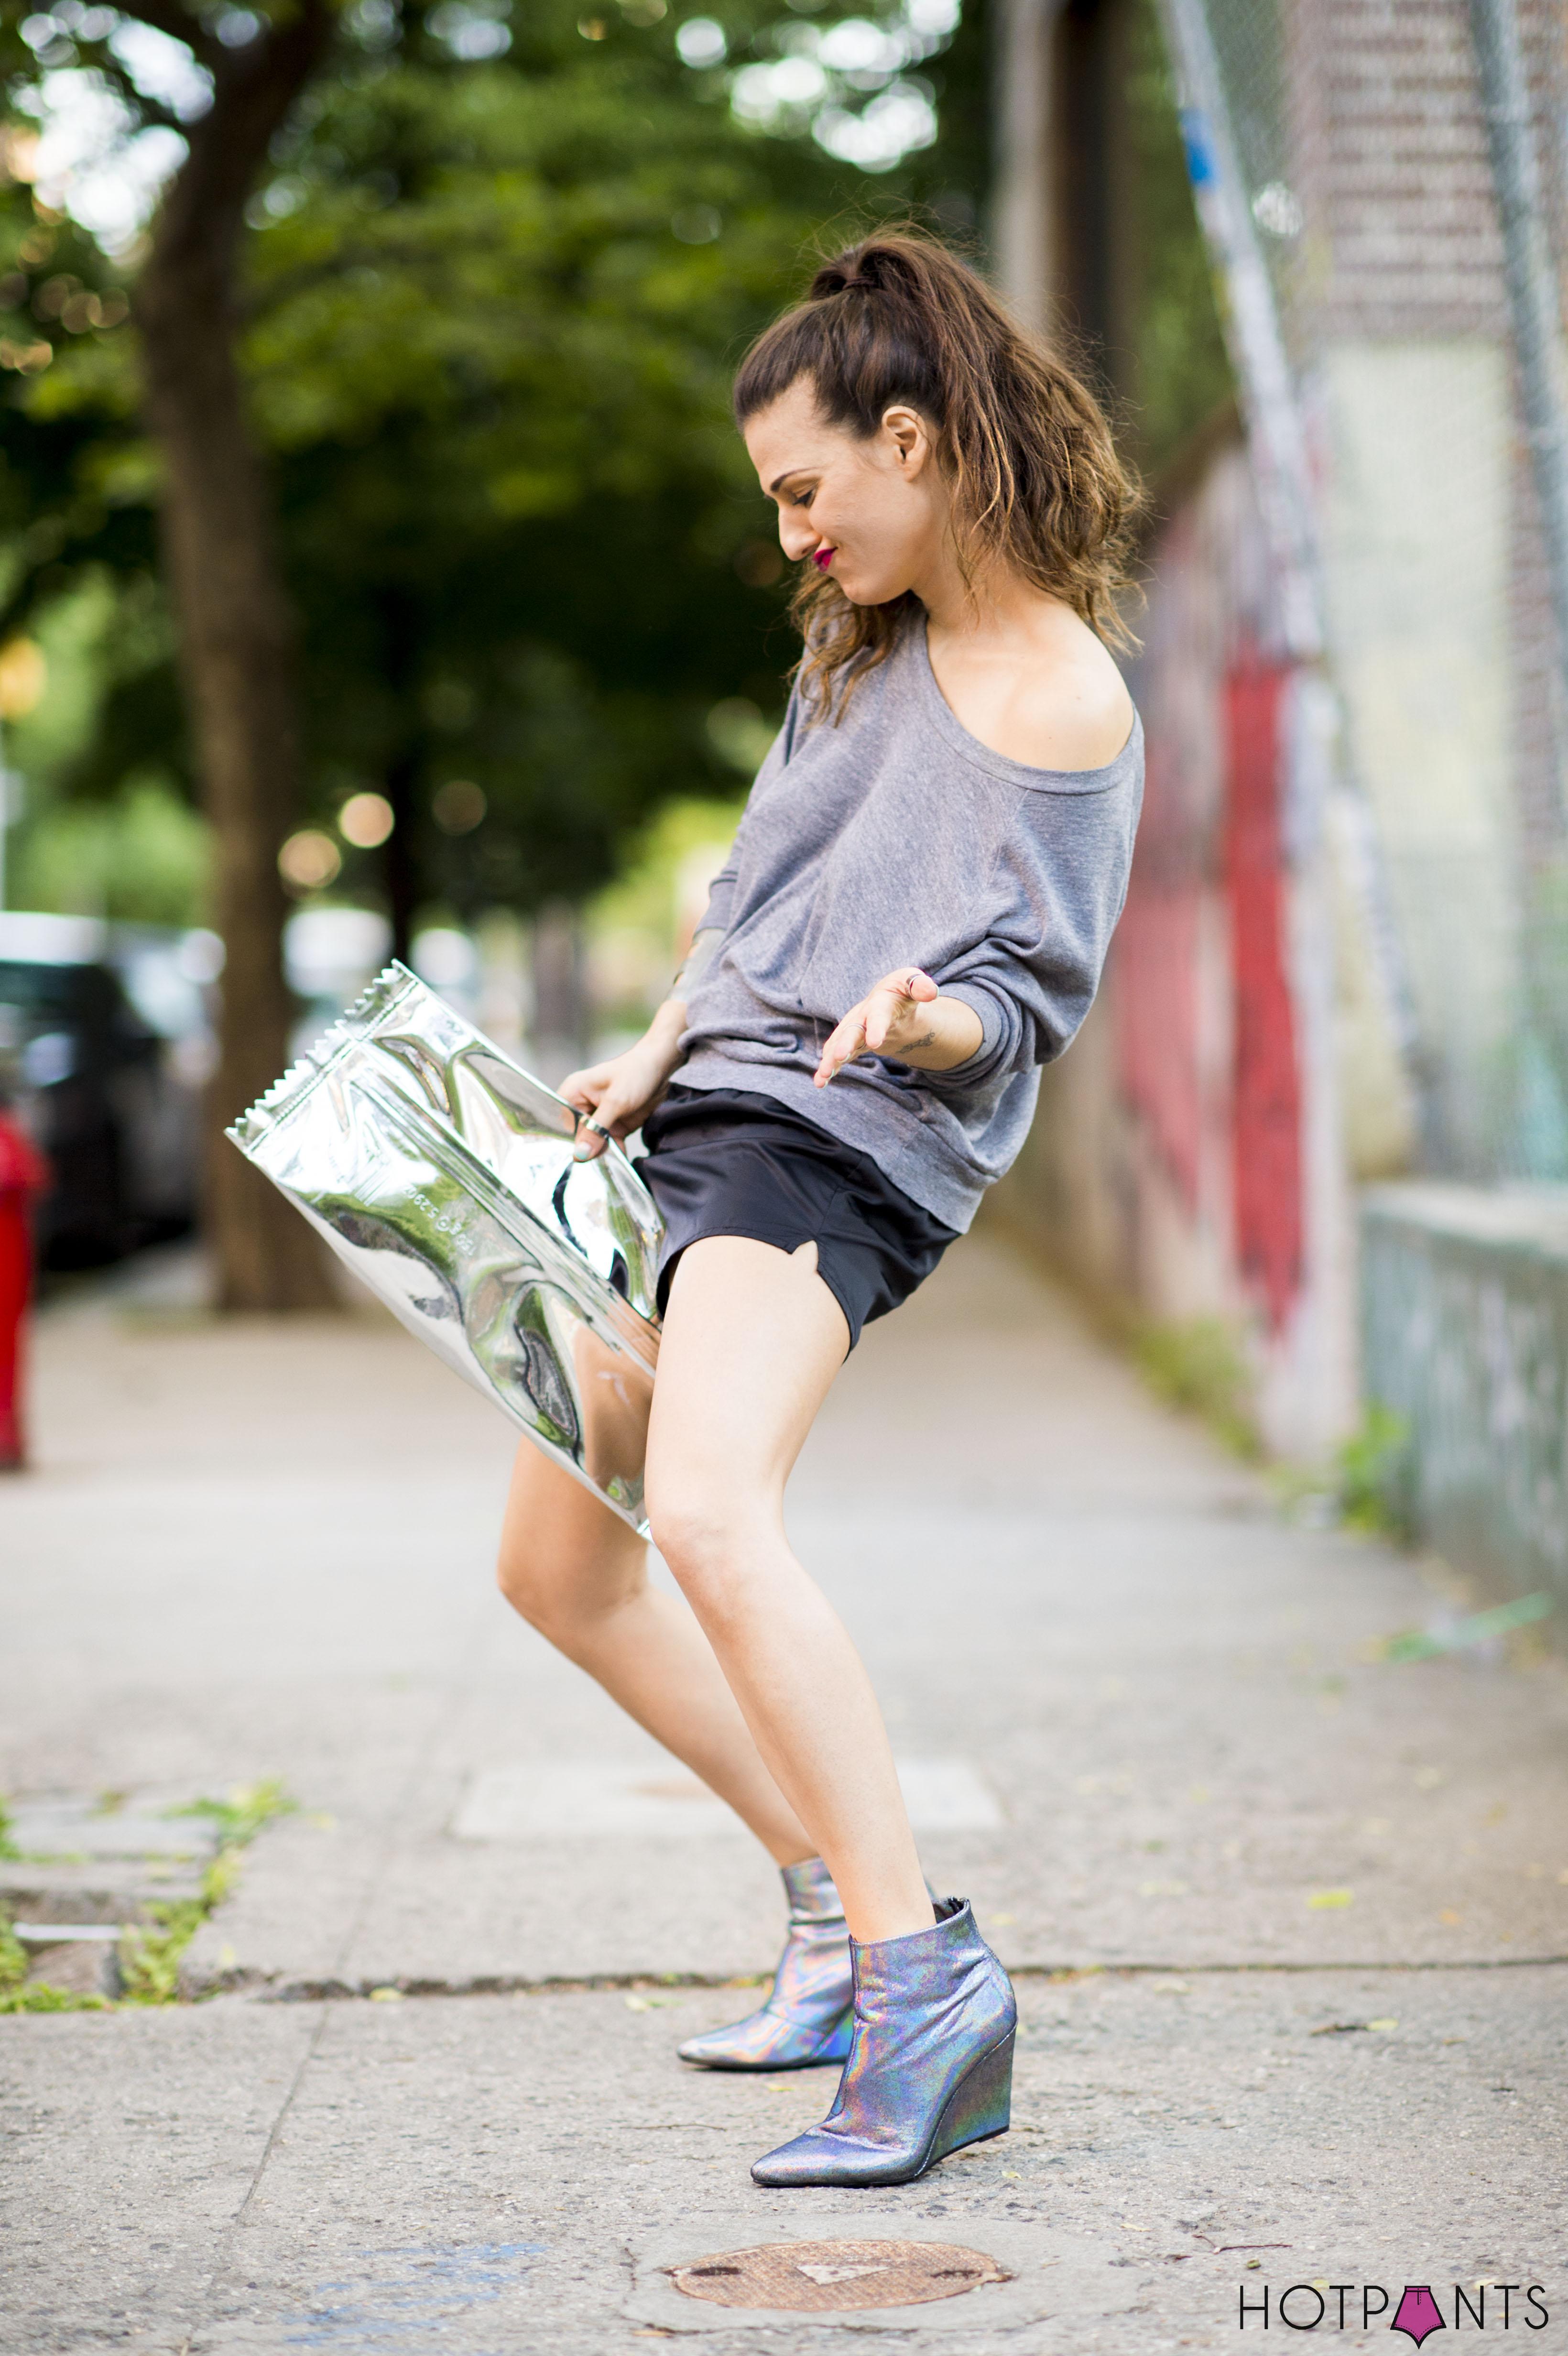 American Apparel Shorts Rainbow Heels Legs Bright Lipstick Streetstyle NYC